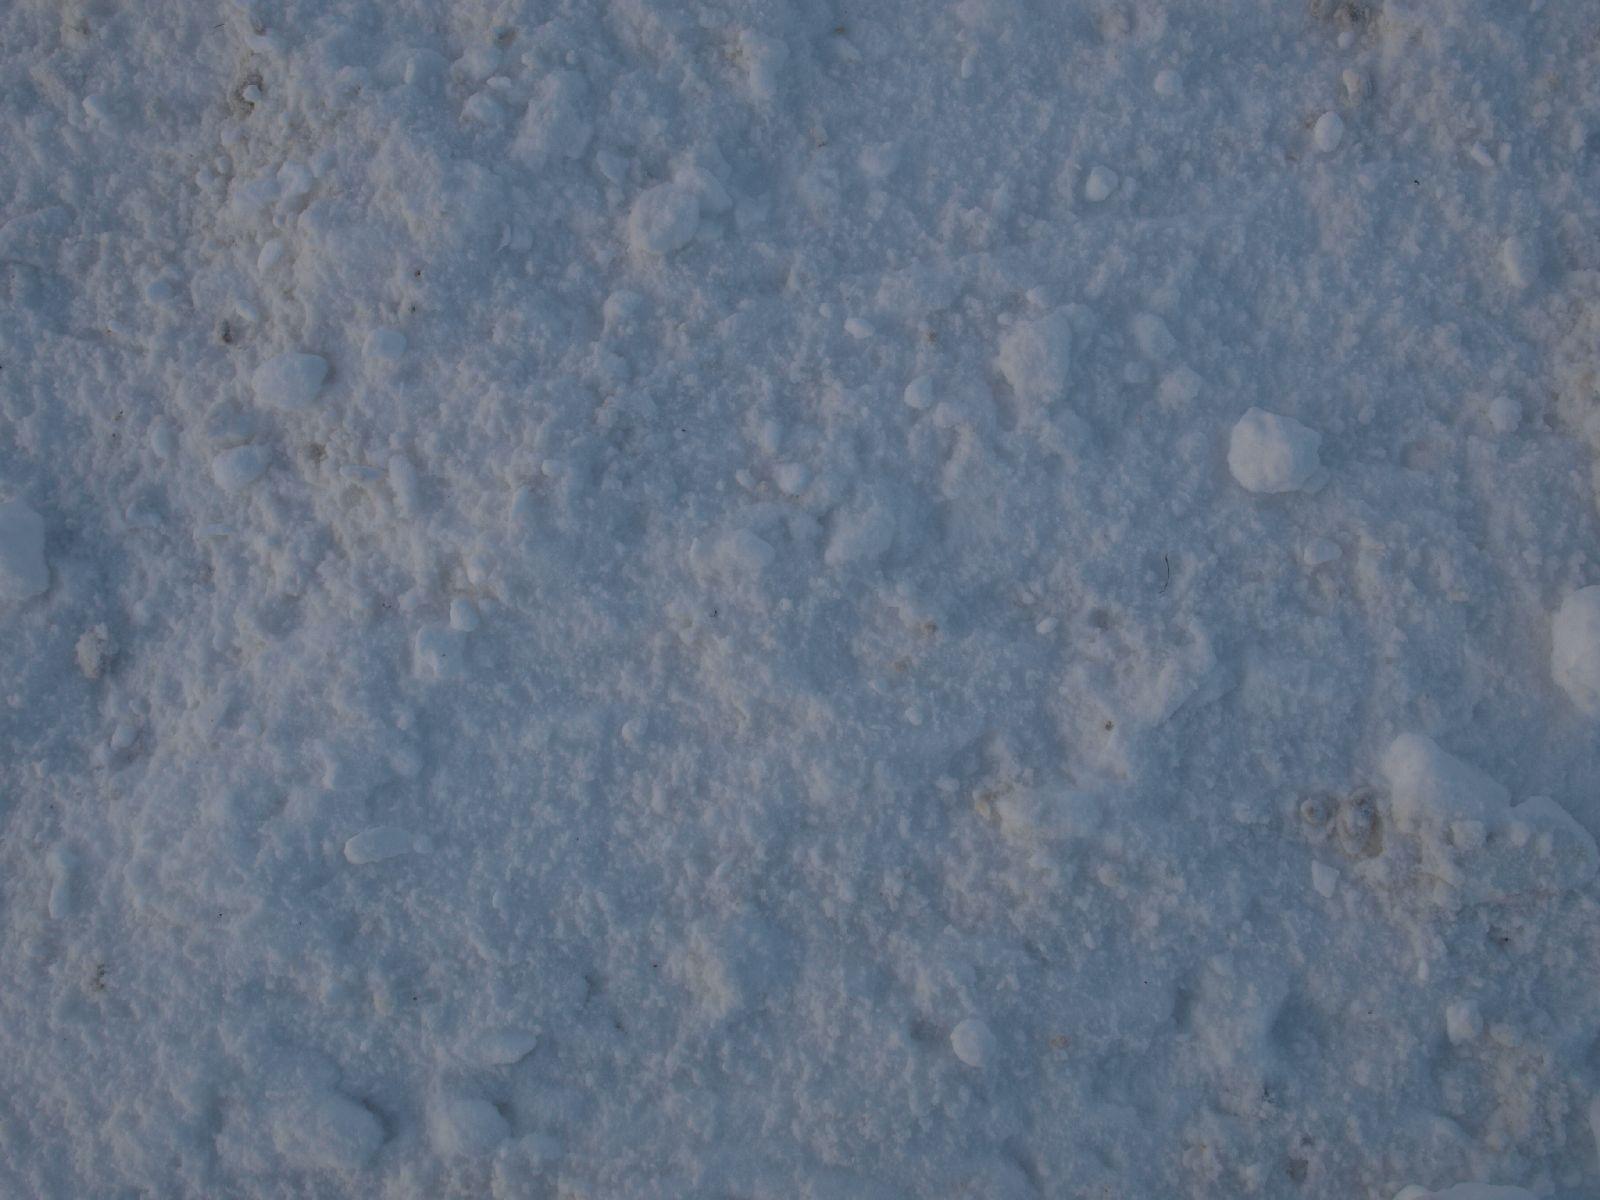 Snow_Texture_A_PC211515